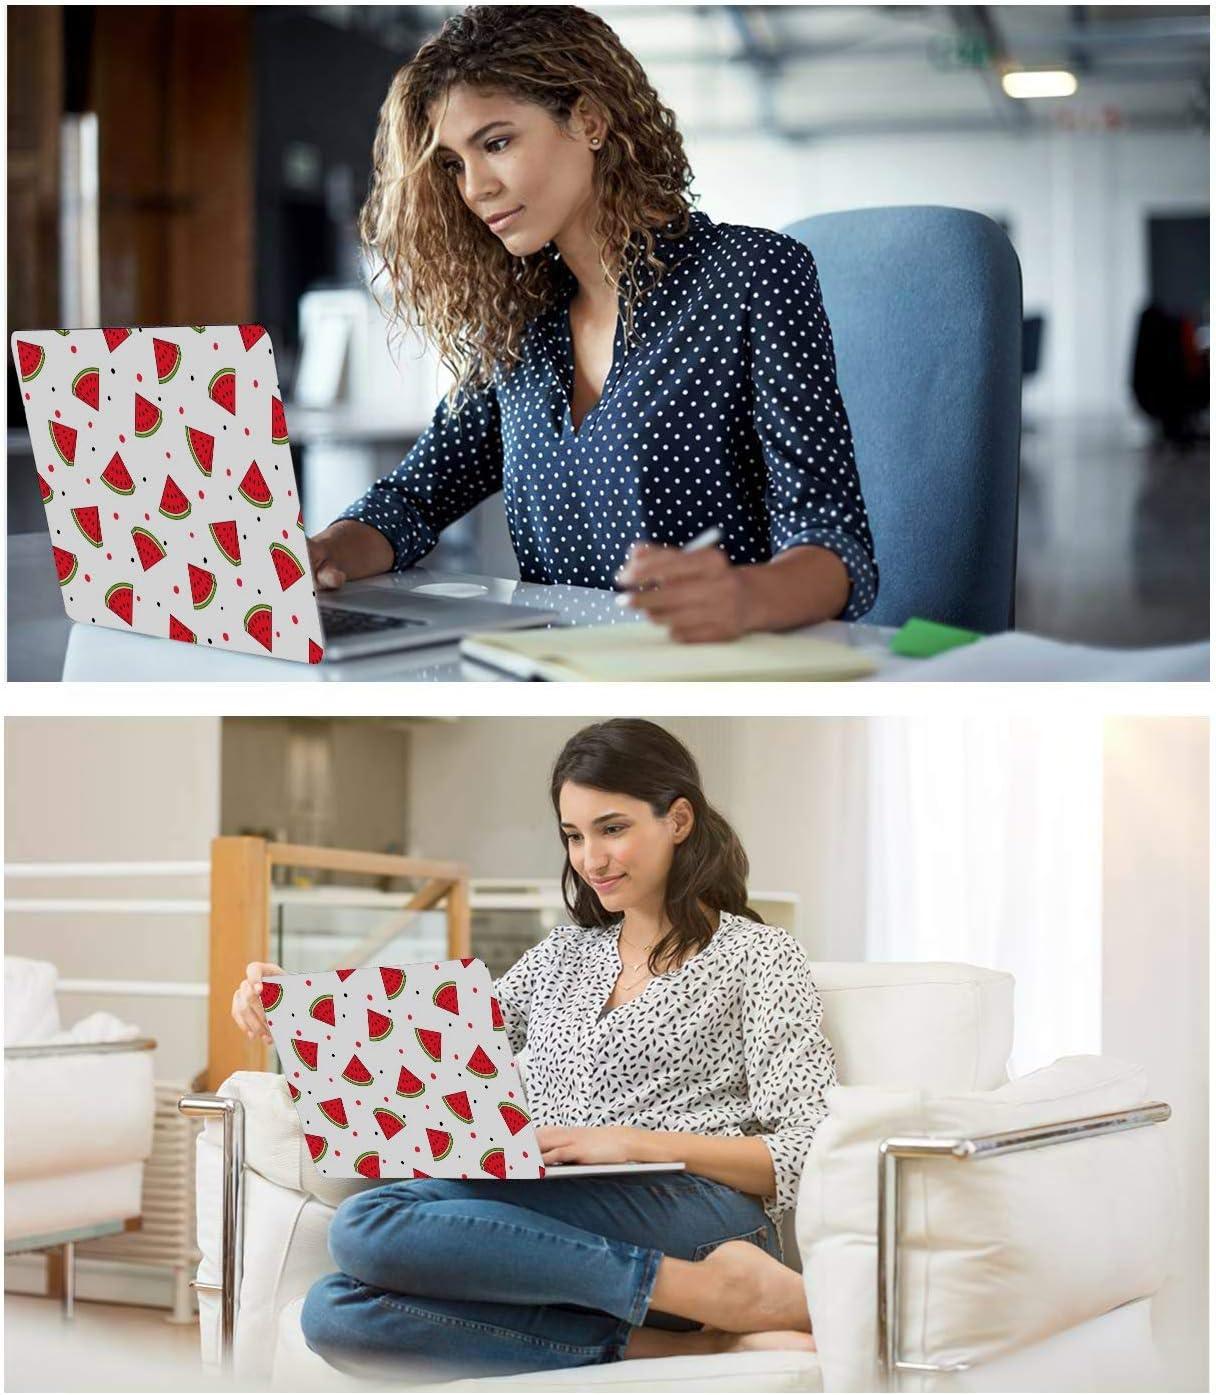 Laptop Case MacBook Pro Summer Fashion Cute Fruit Watermelon Plastic Hard Shell Compatible Mac Air 11 Pro 13 15 MacBook Case Protection for MacBook 2016-2019 Version